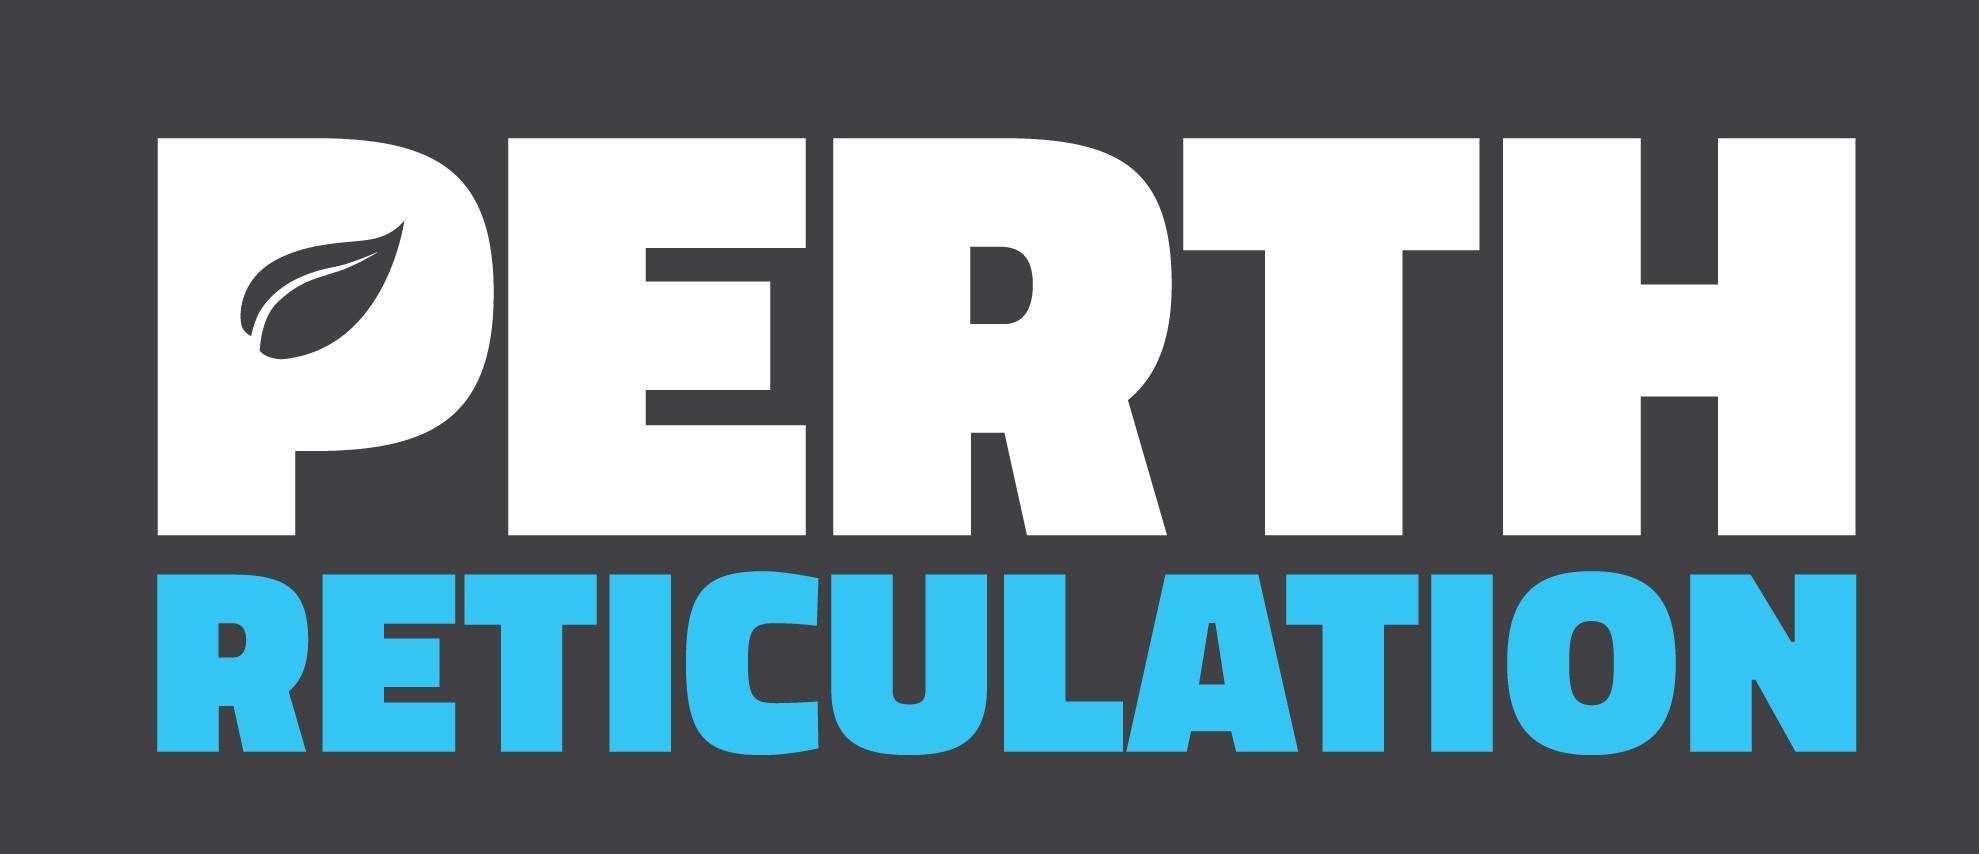 Perth Reticulation Experts